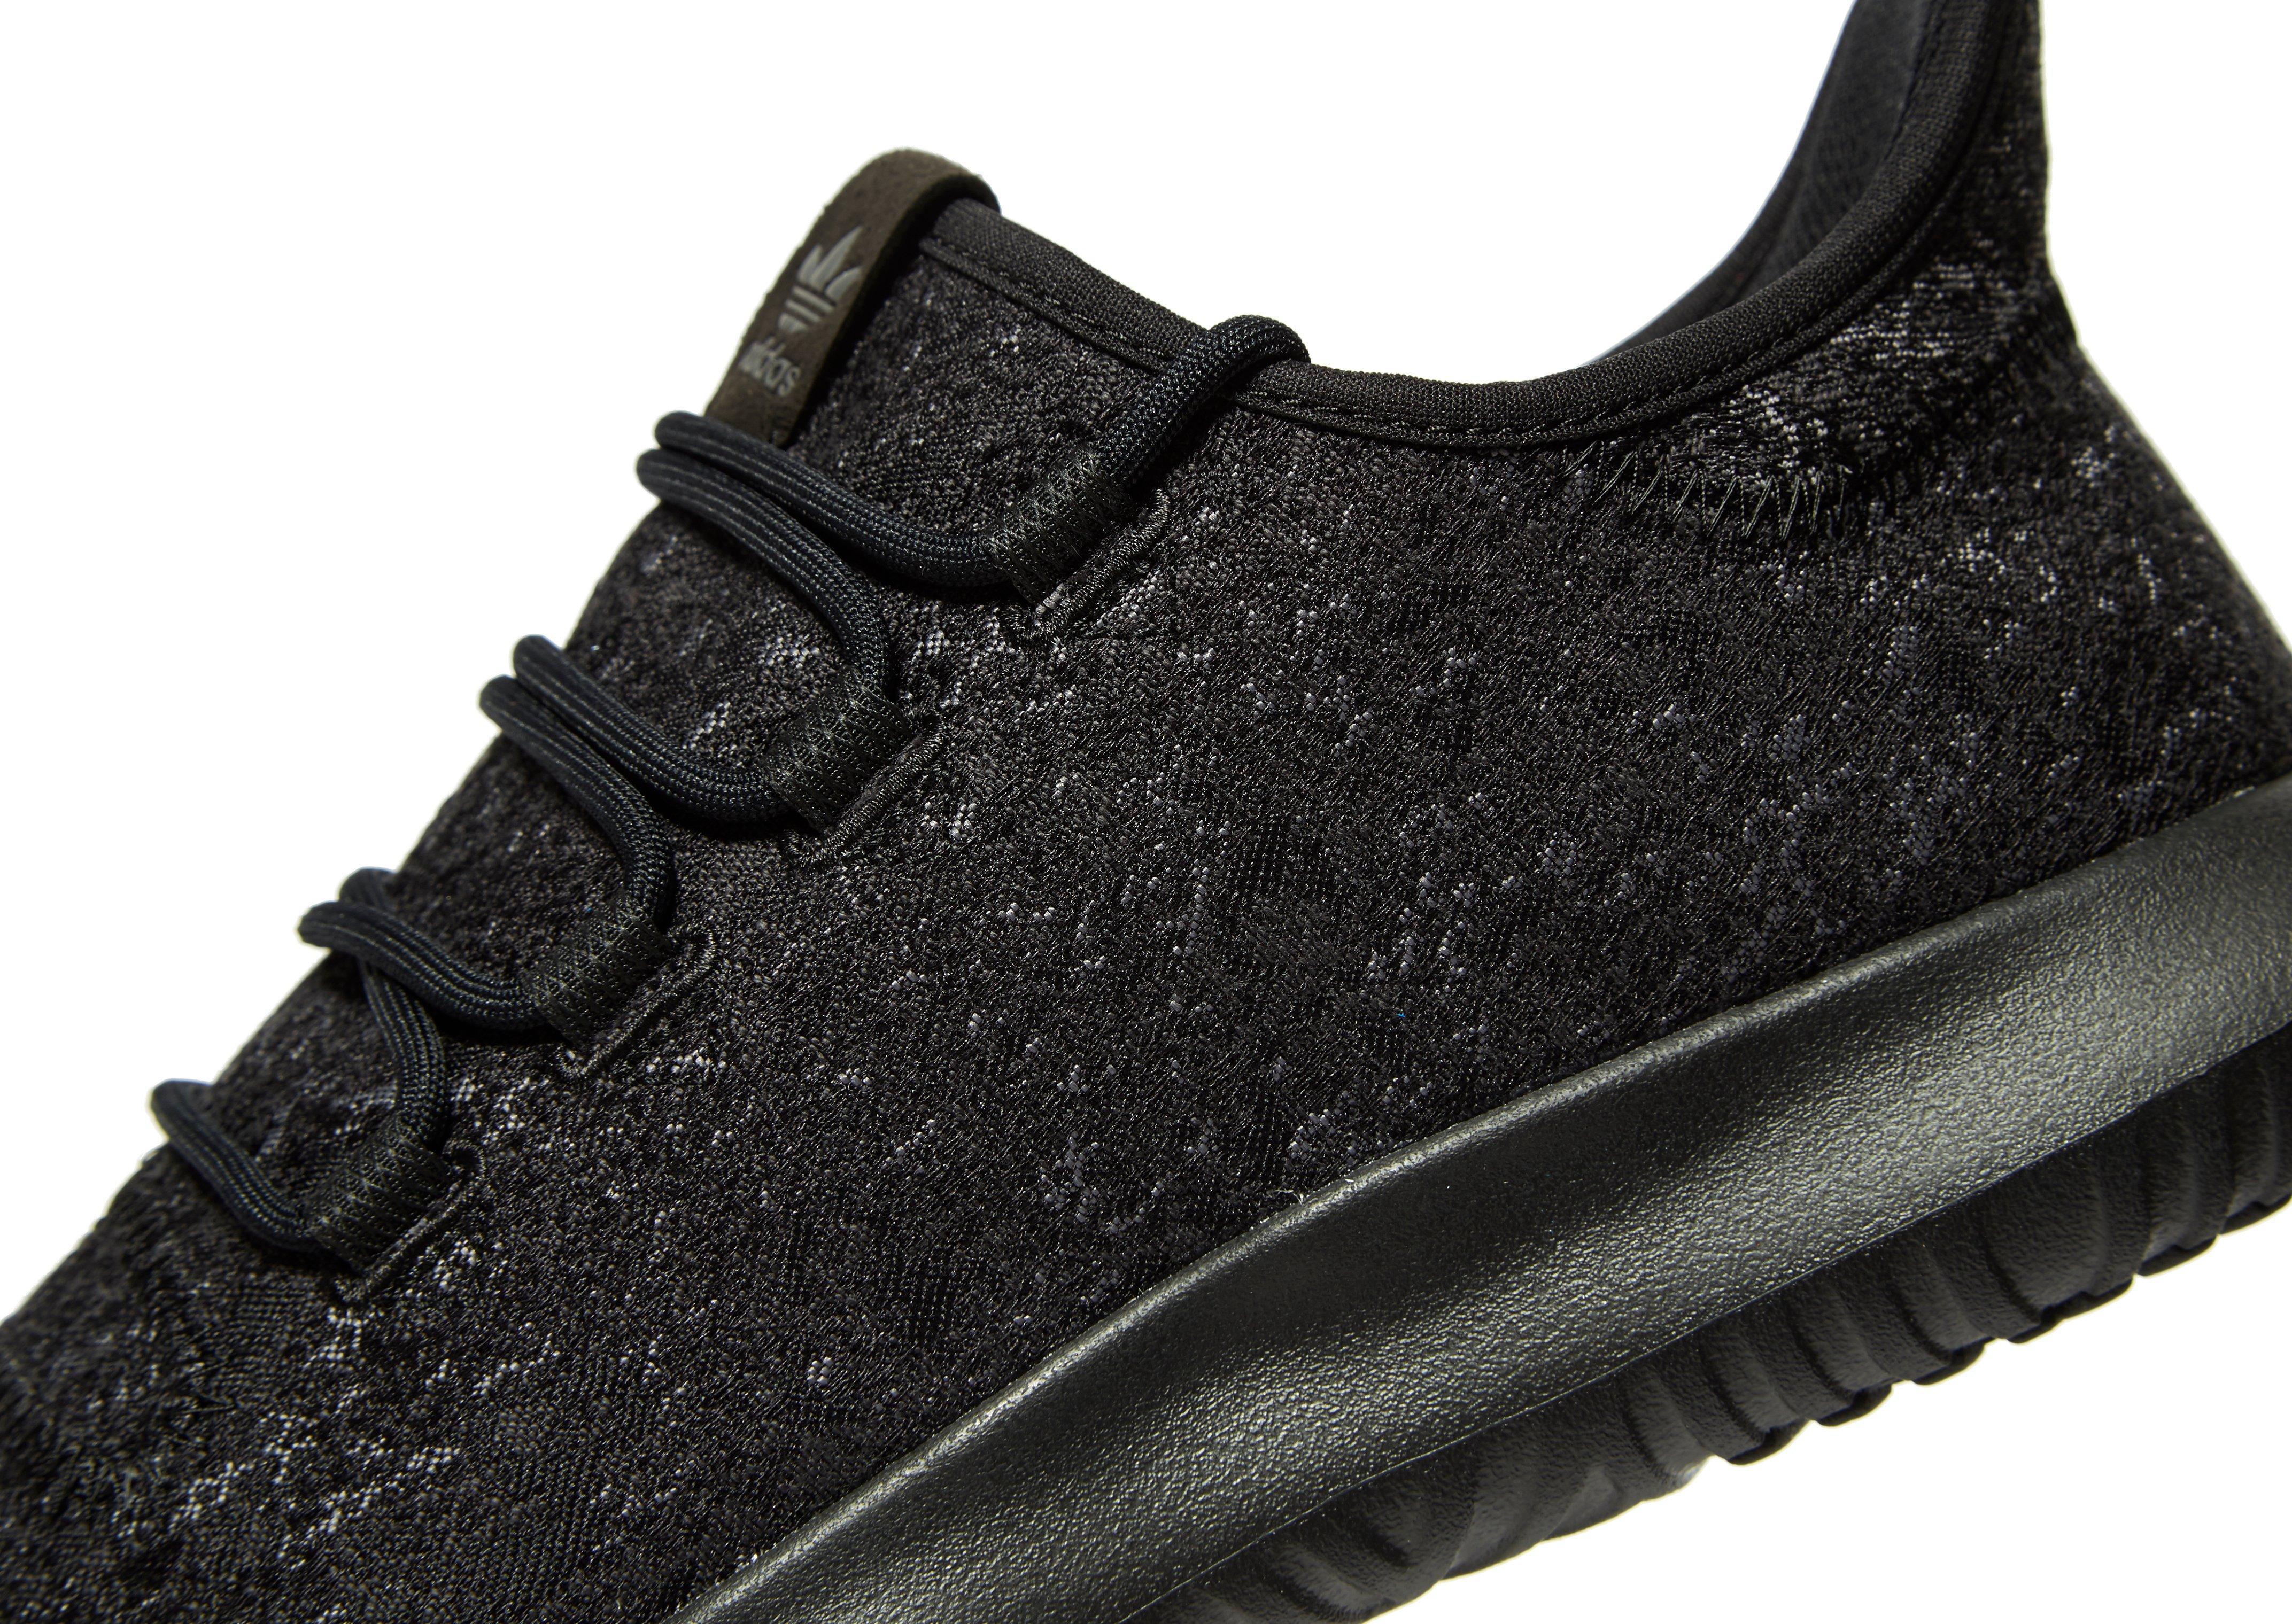 adidas Originals Neoprene Tubular Shadow Jacquard in Black/Grey ...